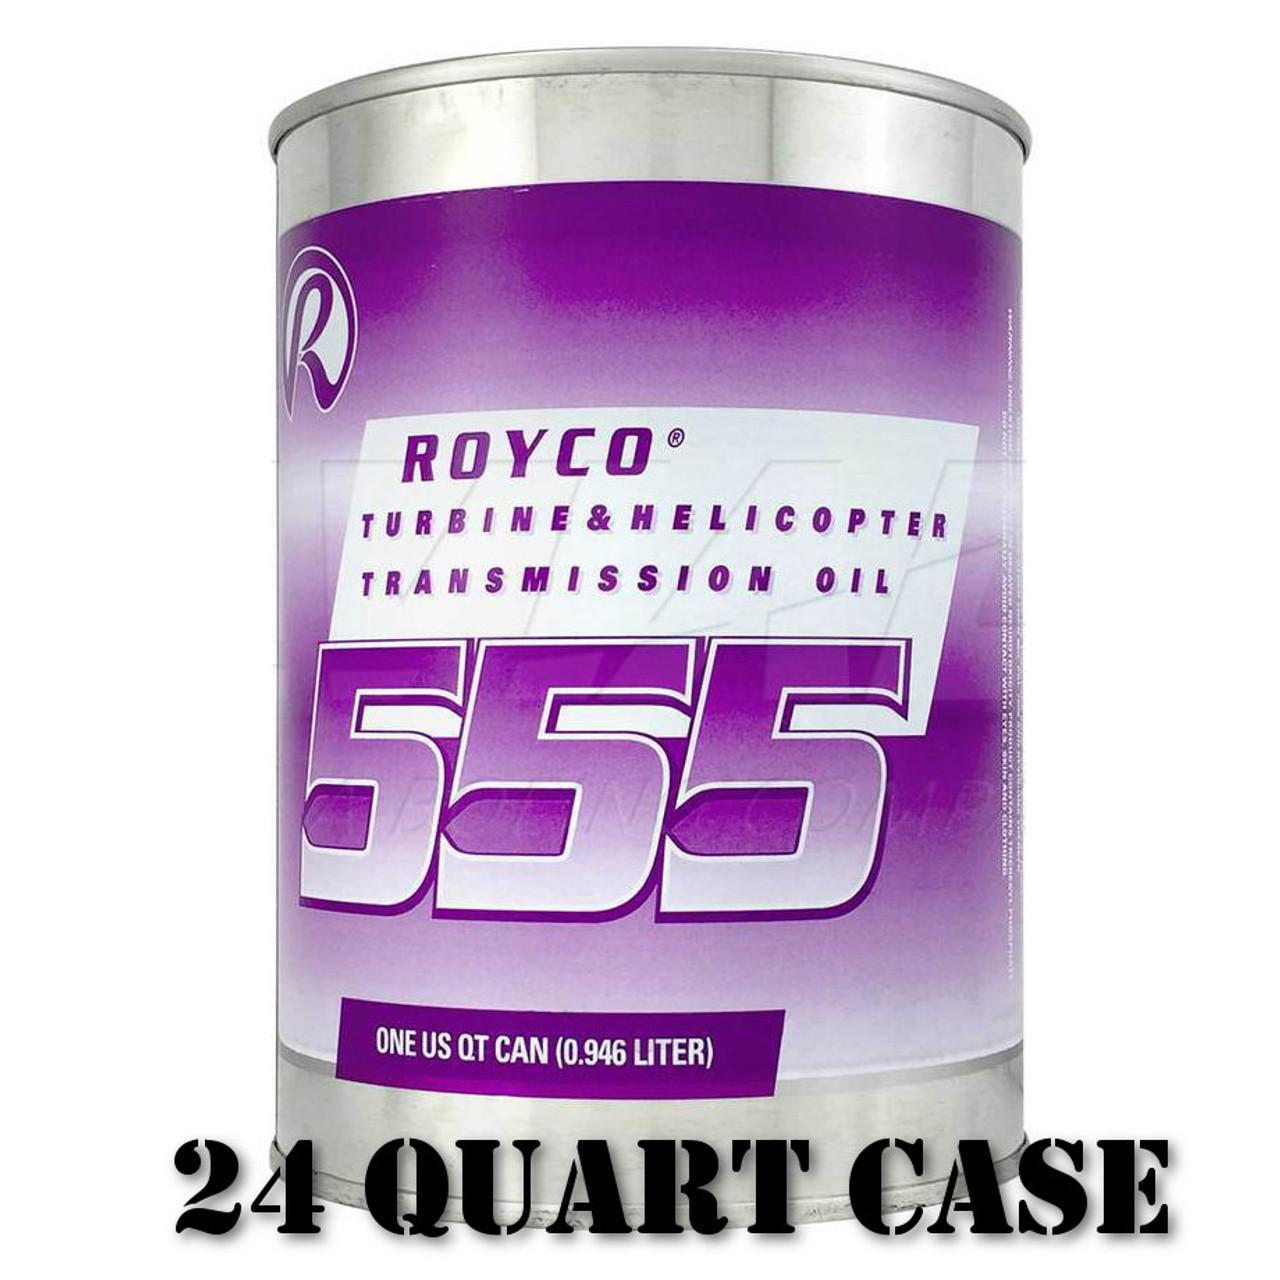 Royco 555 Turbine & Helicopter Transmission Oil - 24 Quart Case